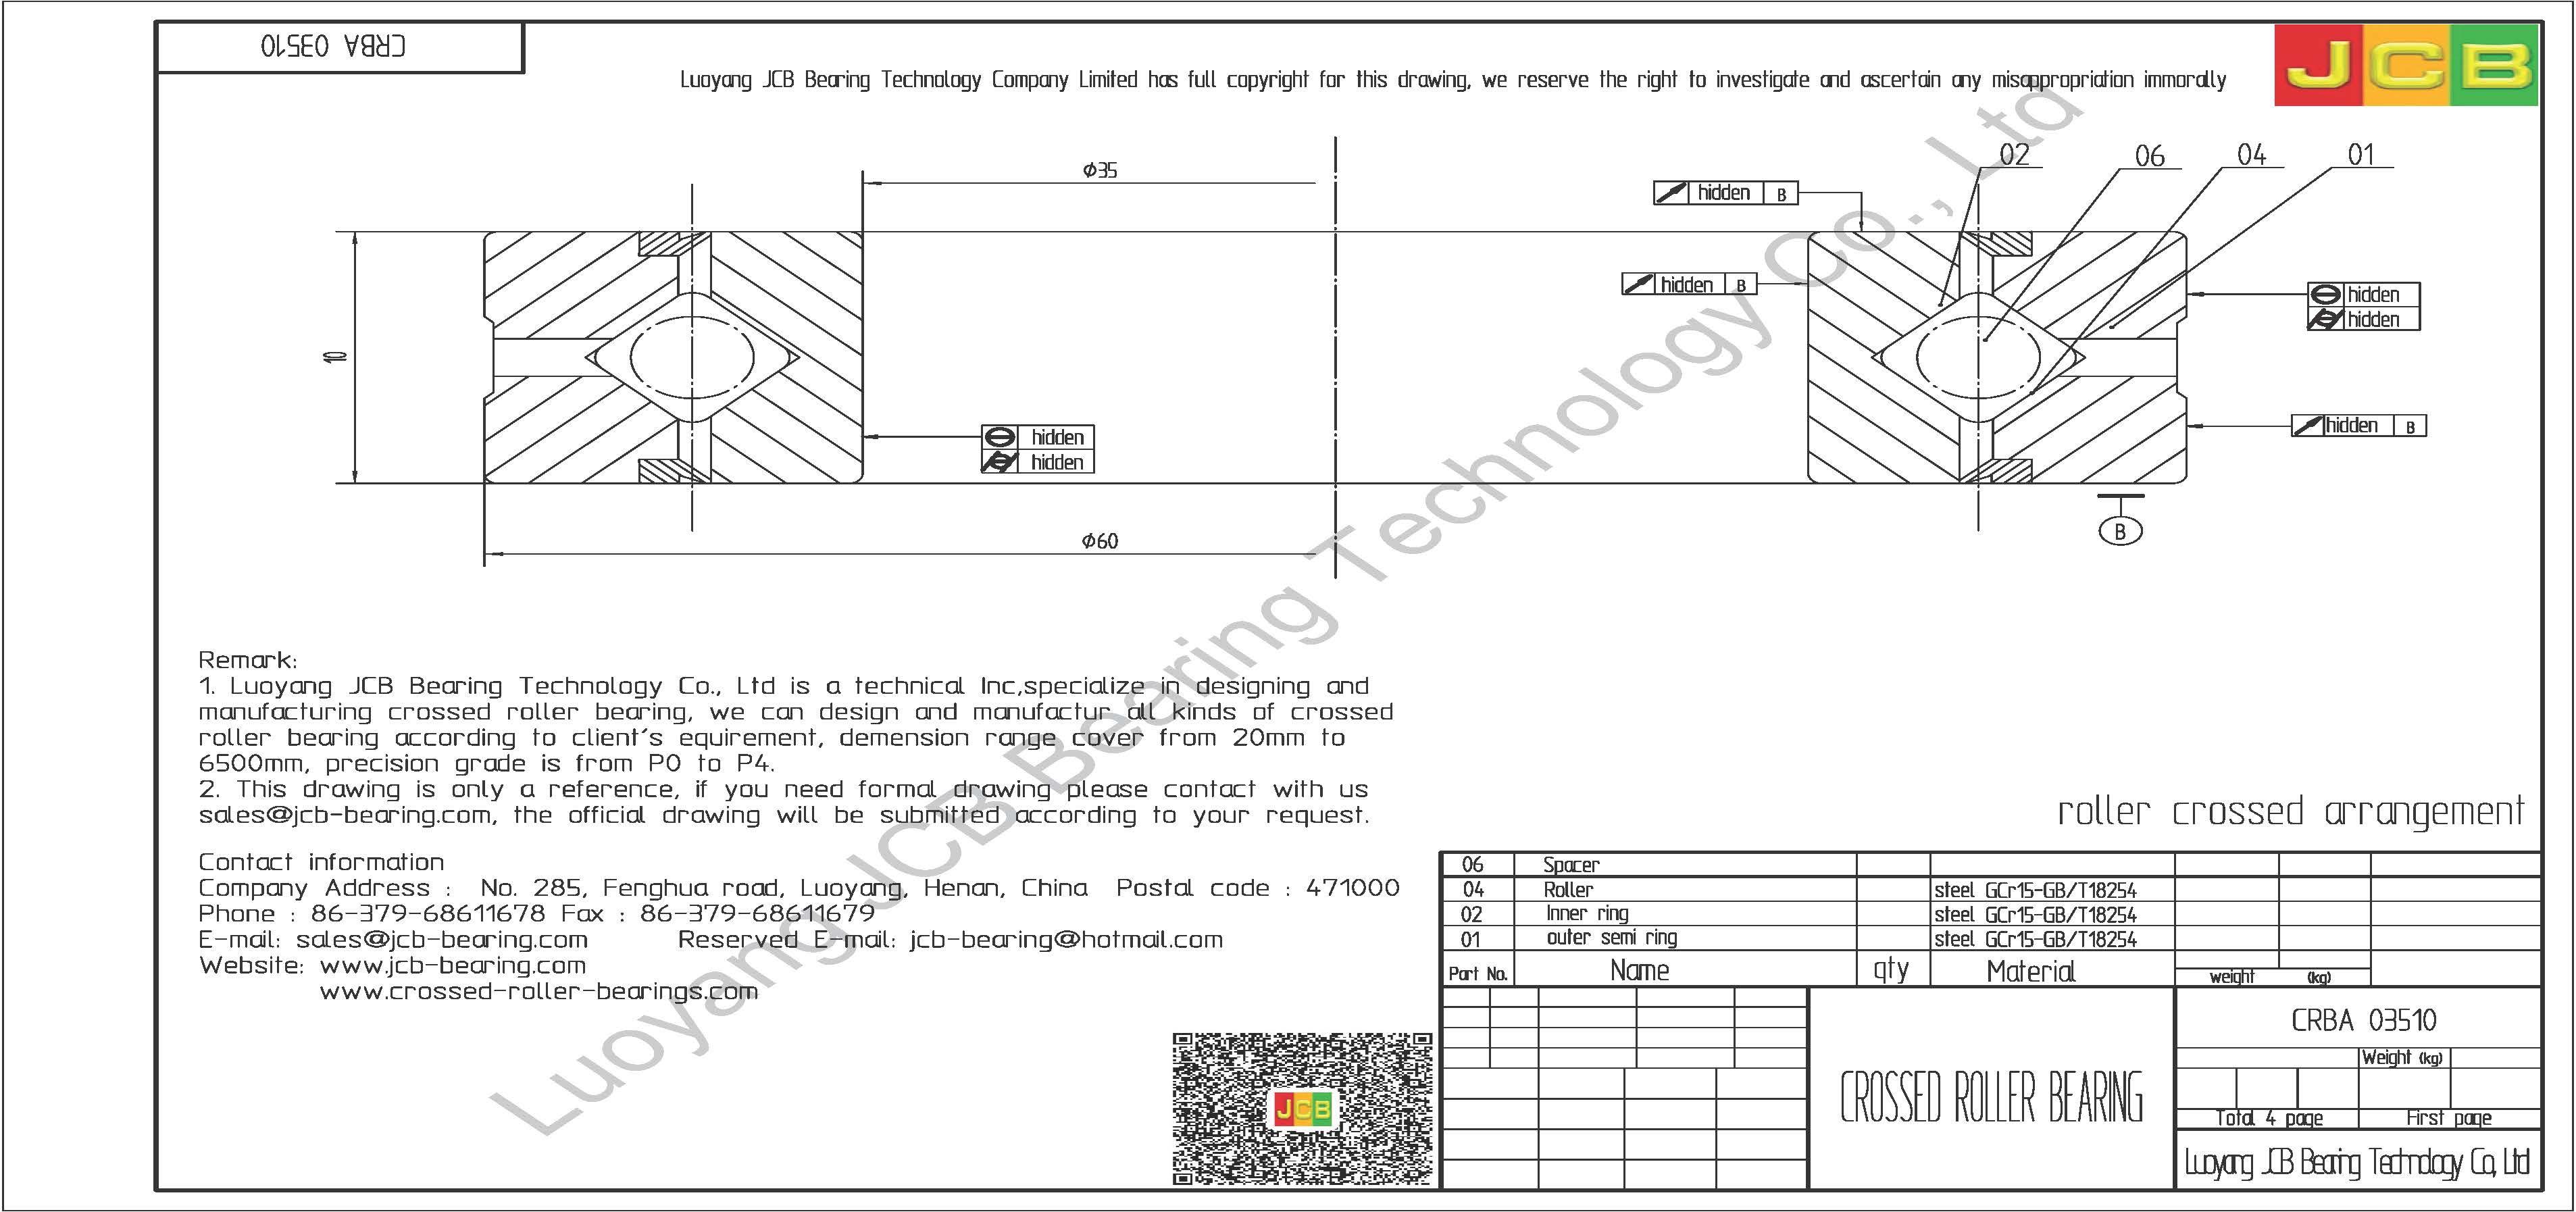 CRBA 03510 HIWIN CROSSED ROLLER BEARING